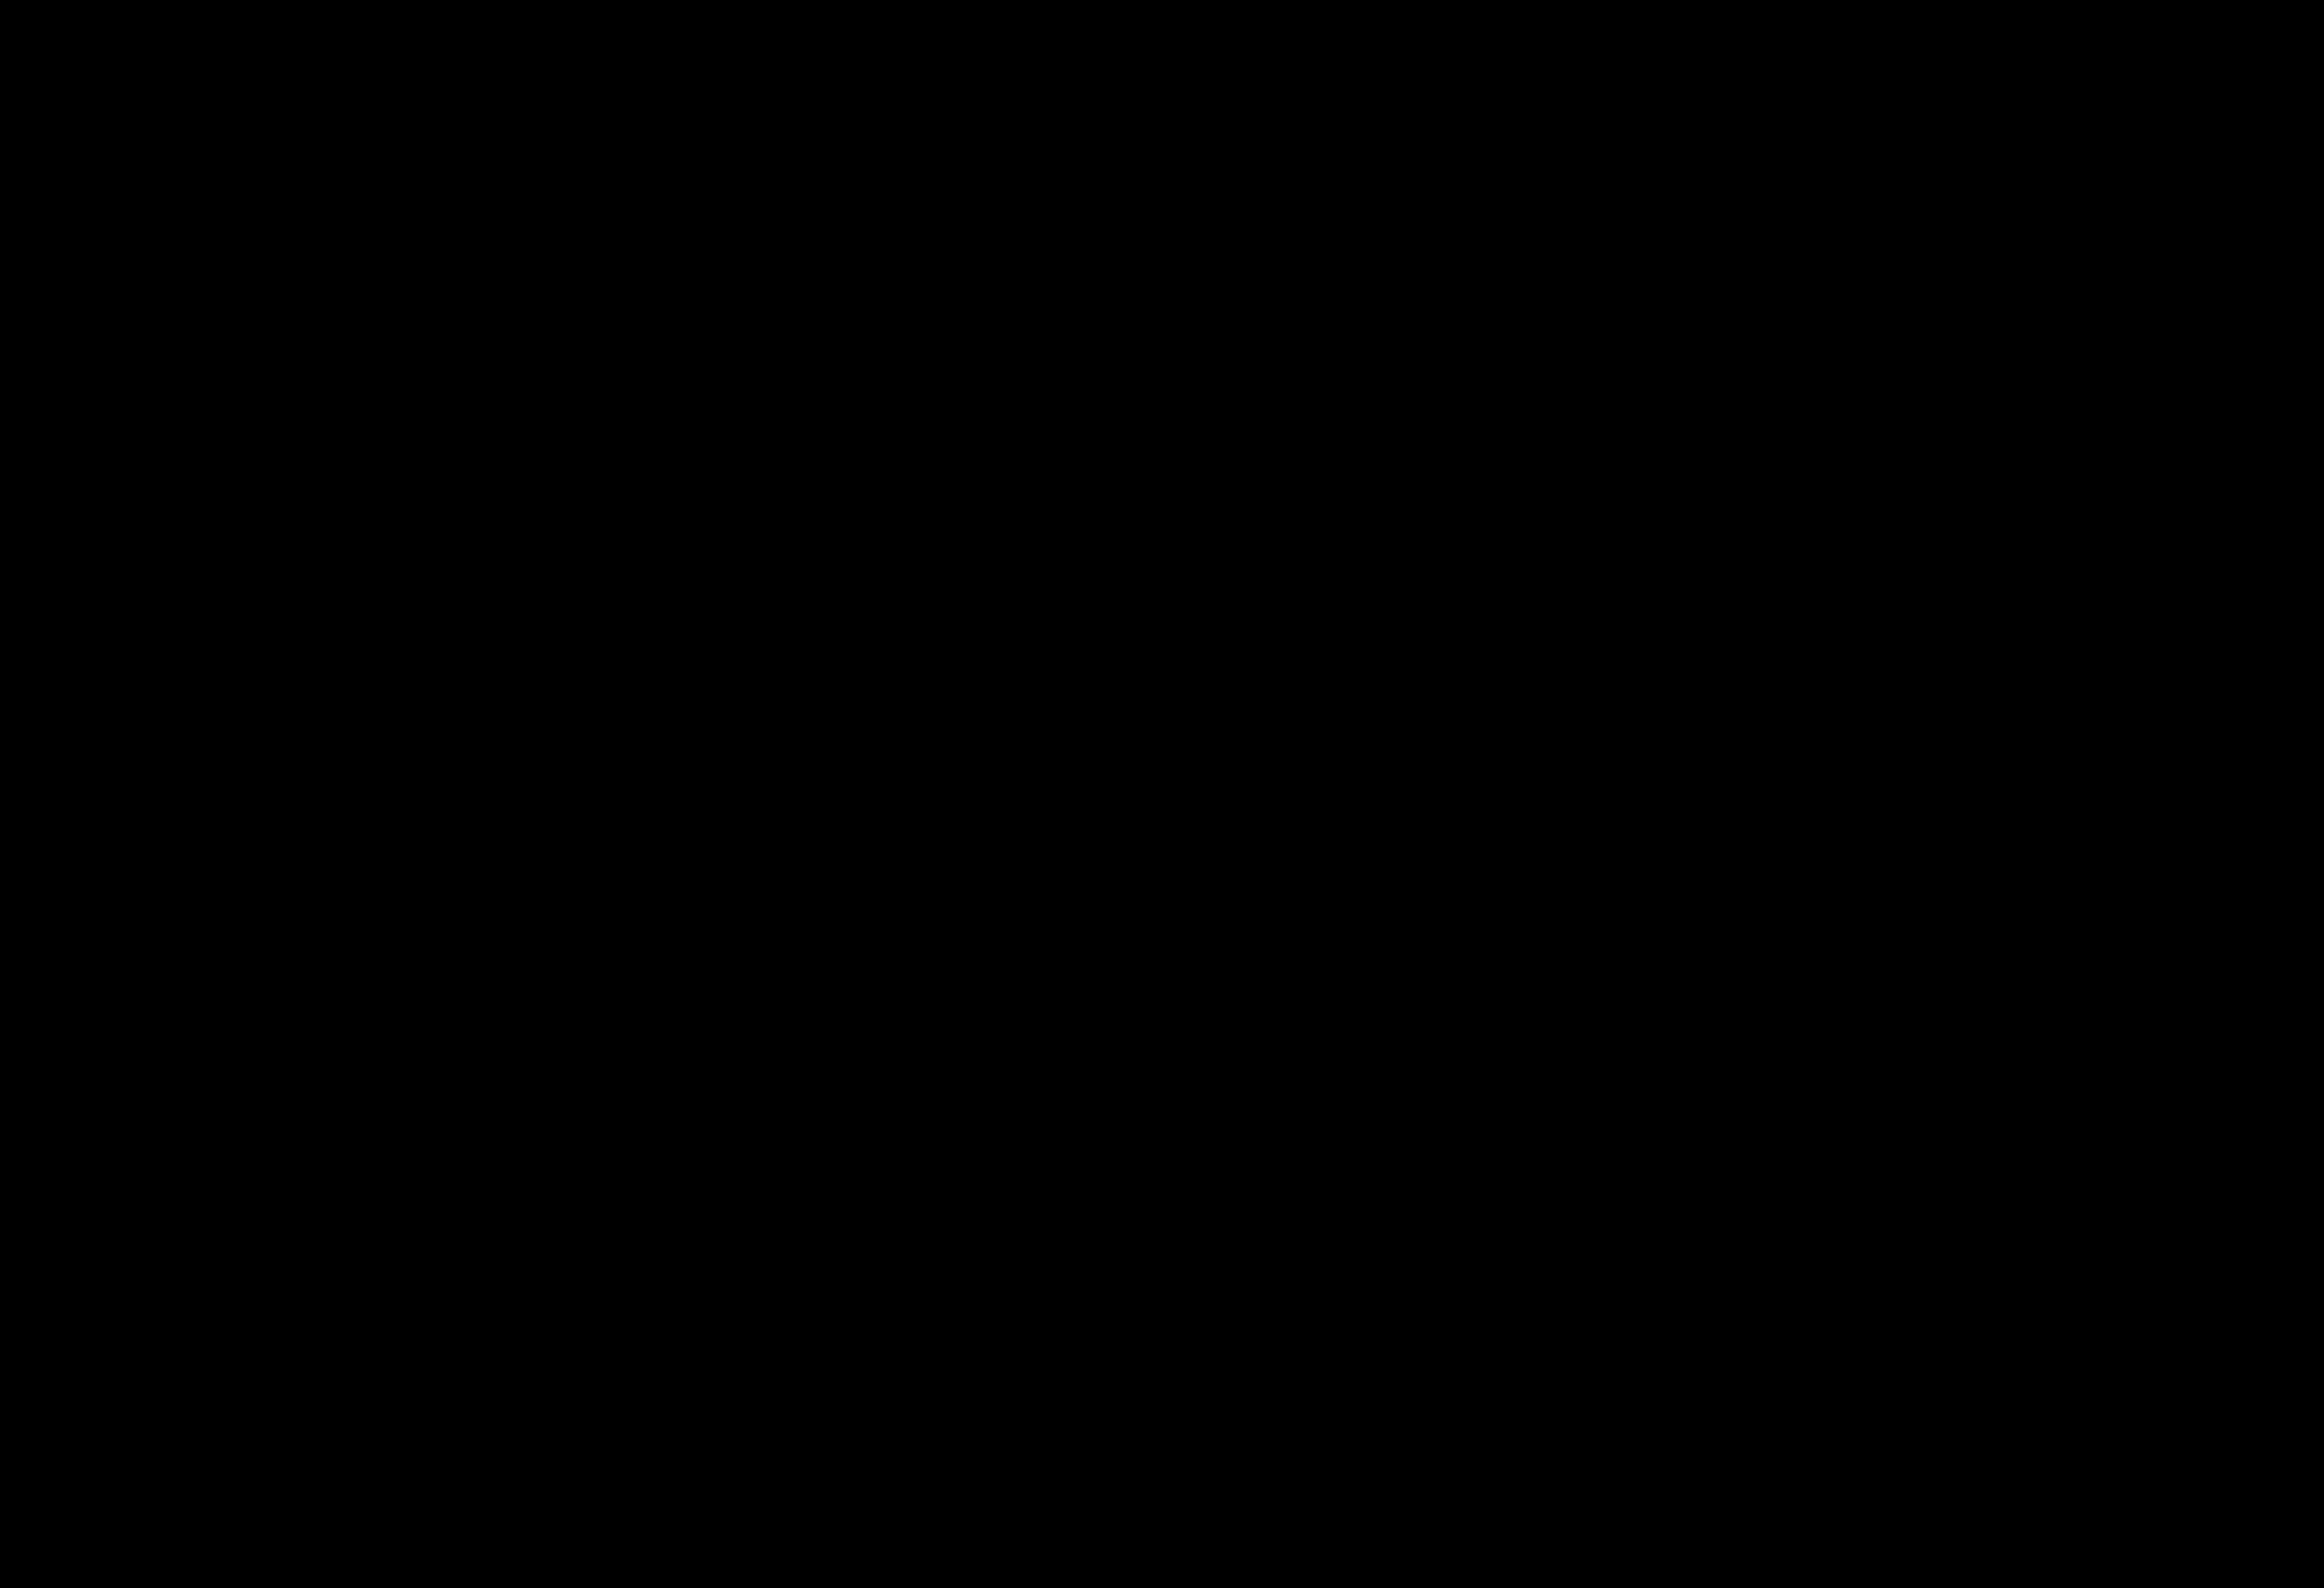 2400x1640 Clipart